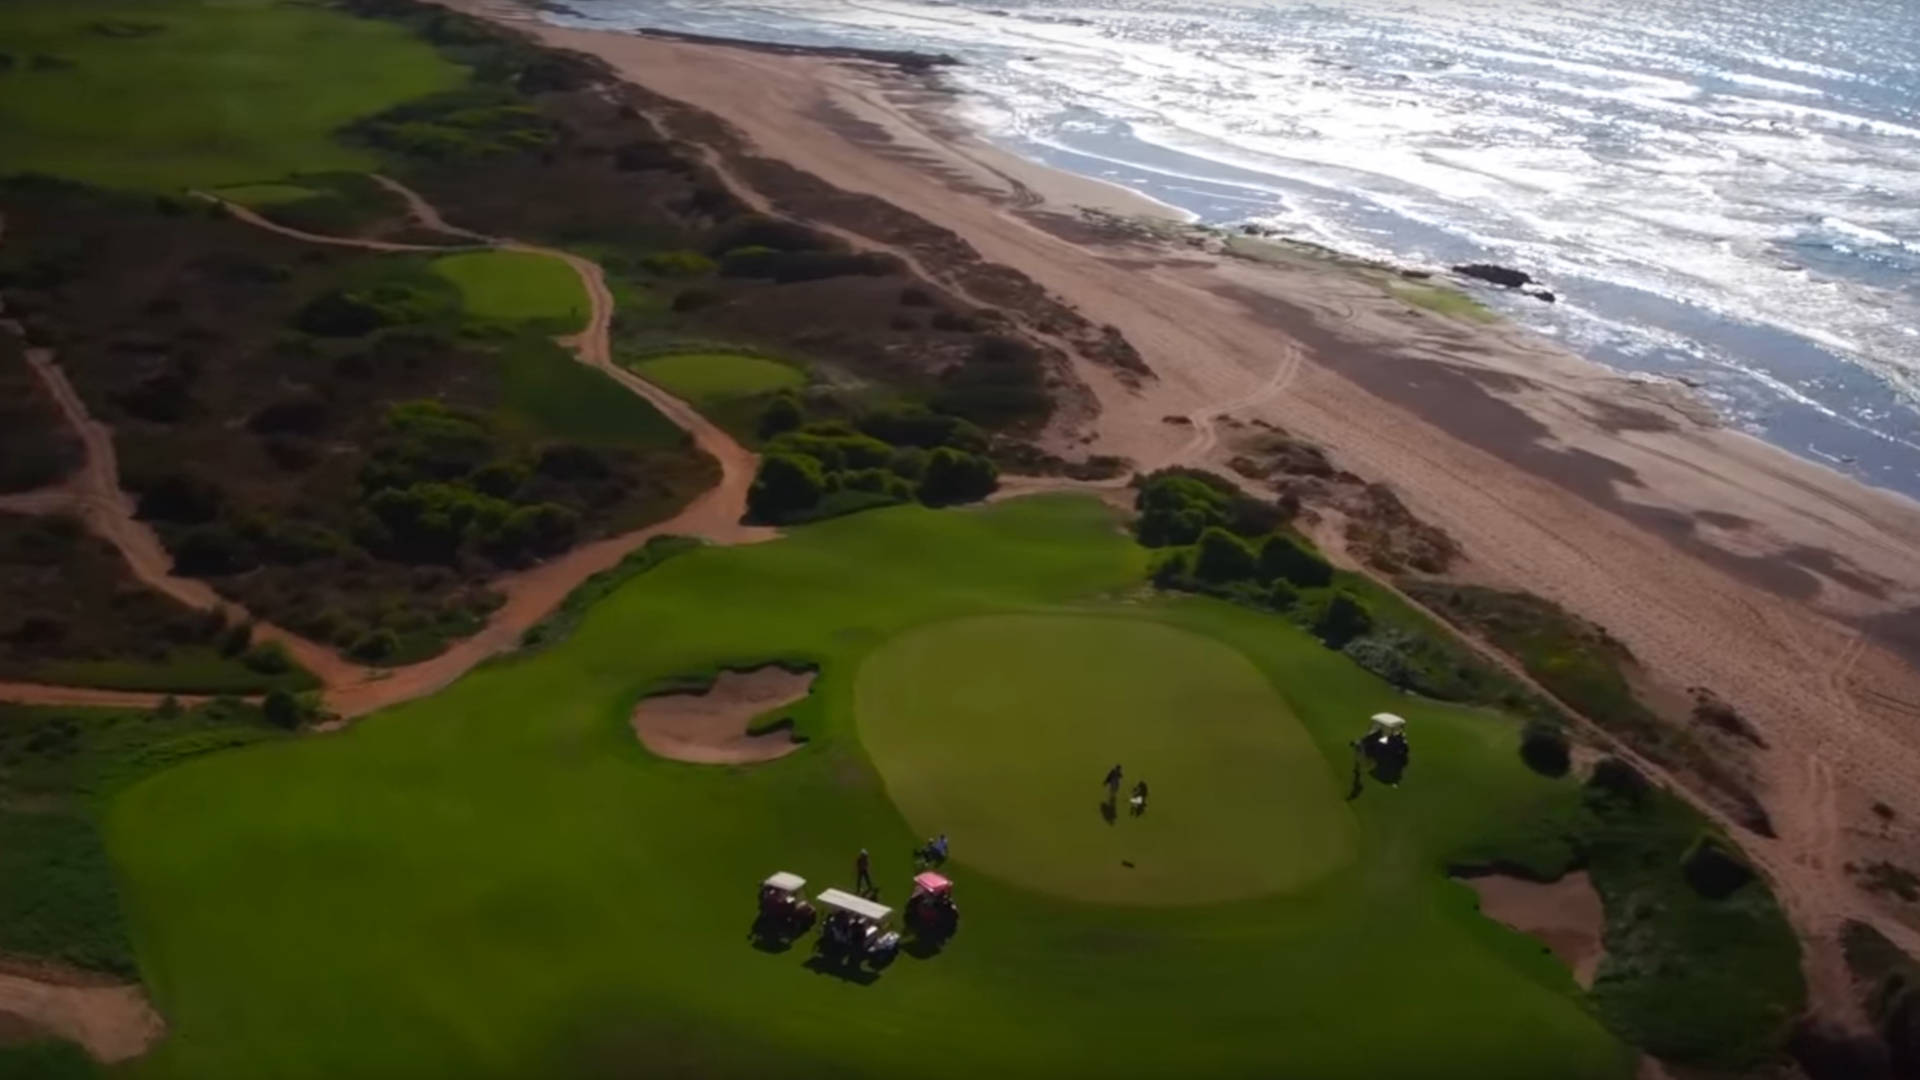 romantica_golf_cup_2019_mazagan_05